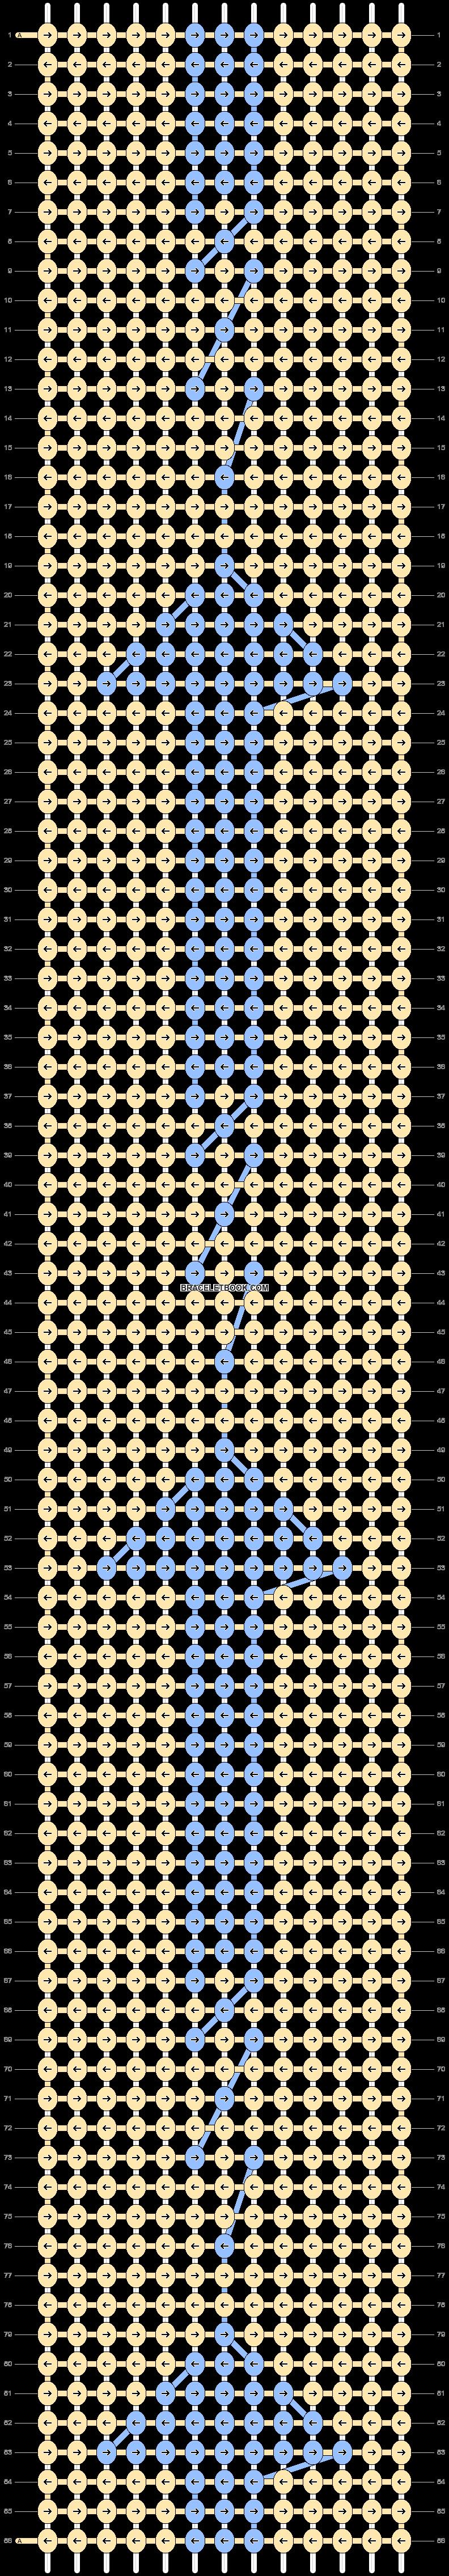 Alpha pattern #20136 pattern